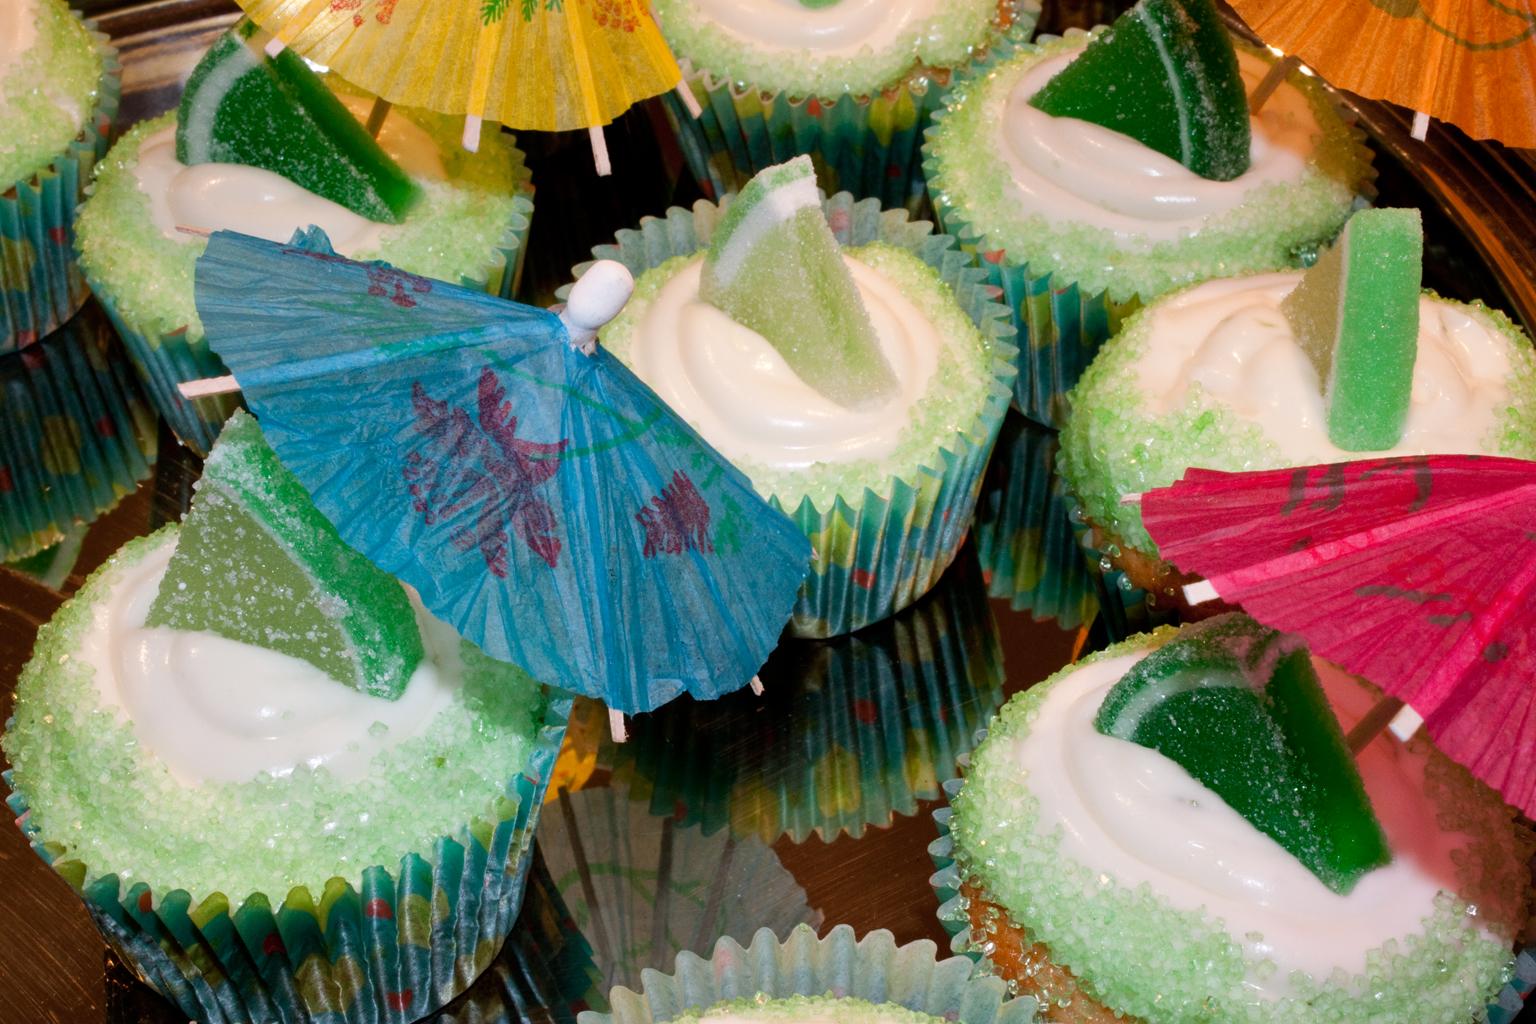 mrgarita cupcakes with parasols